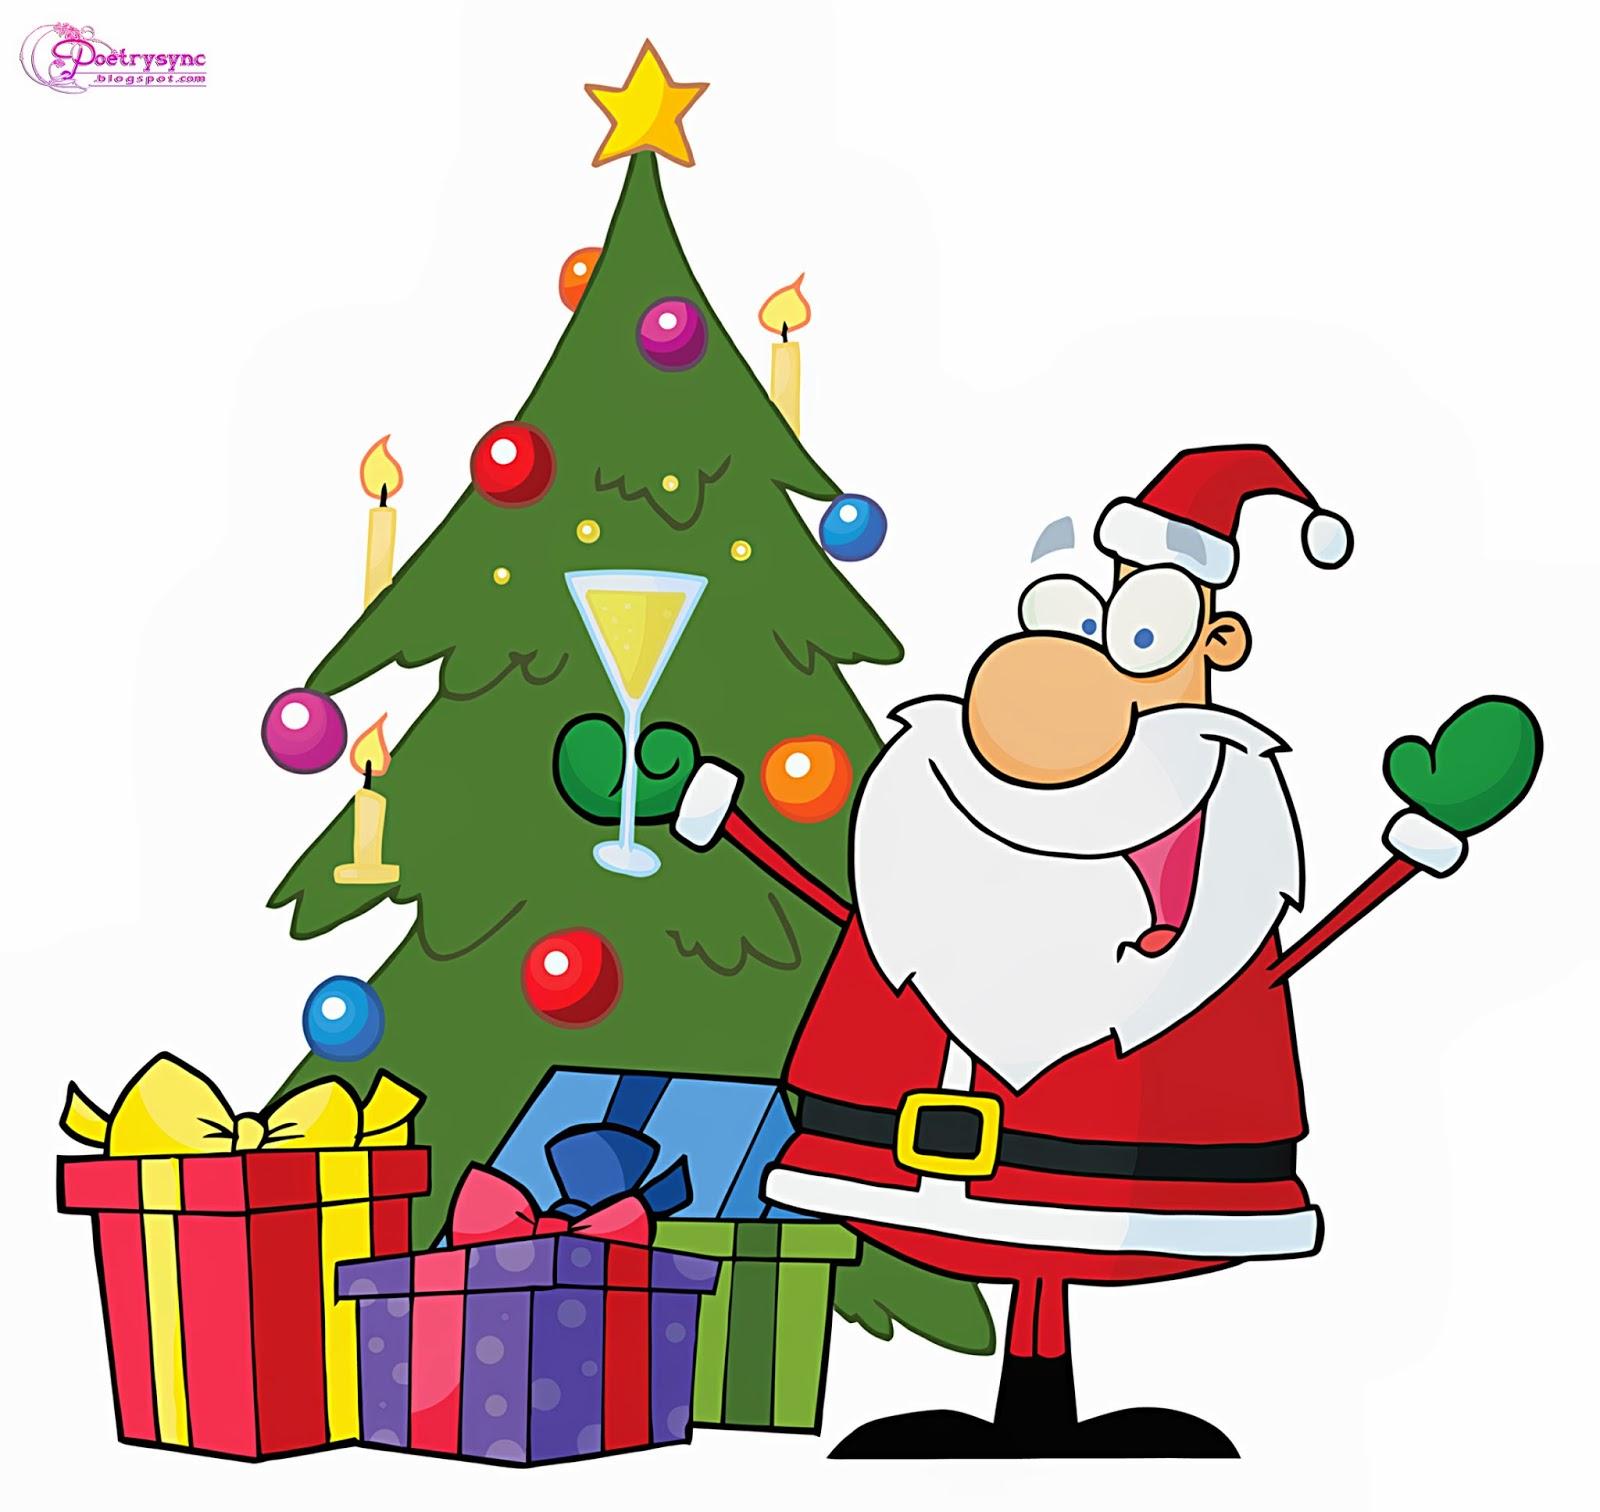 Christmas festival clipart